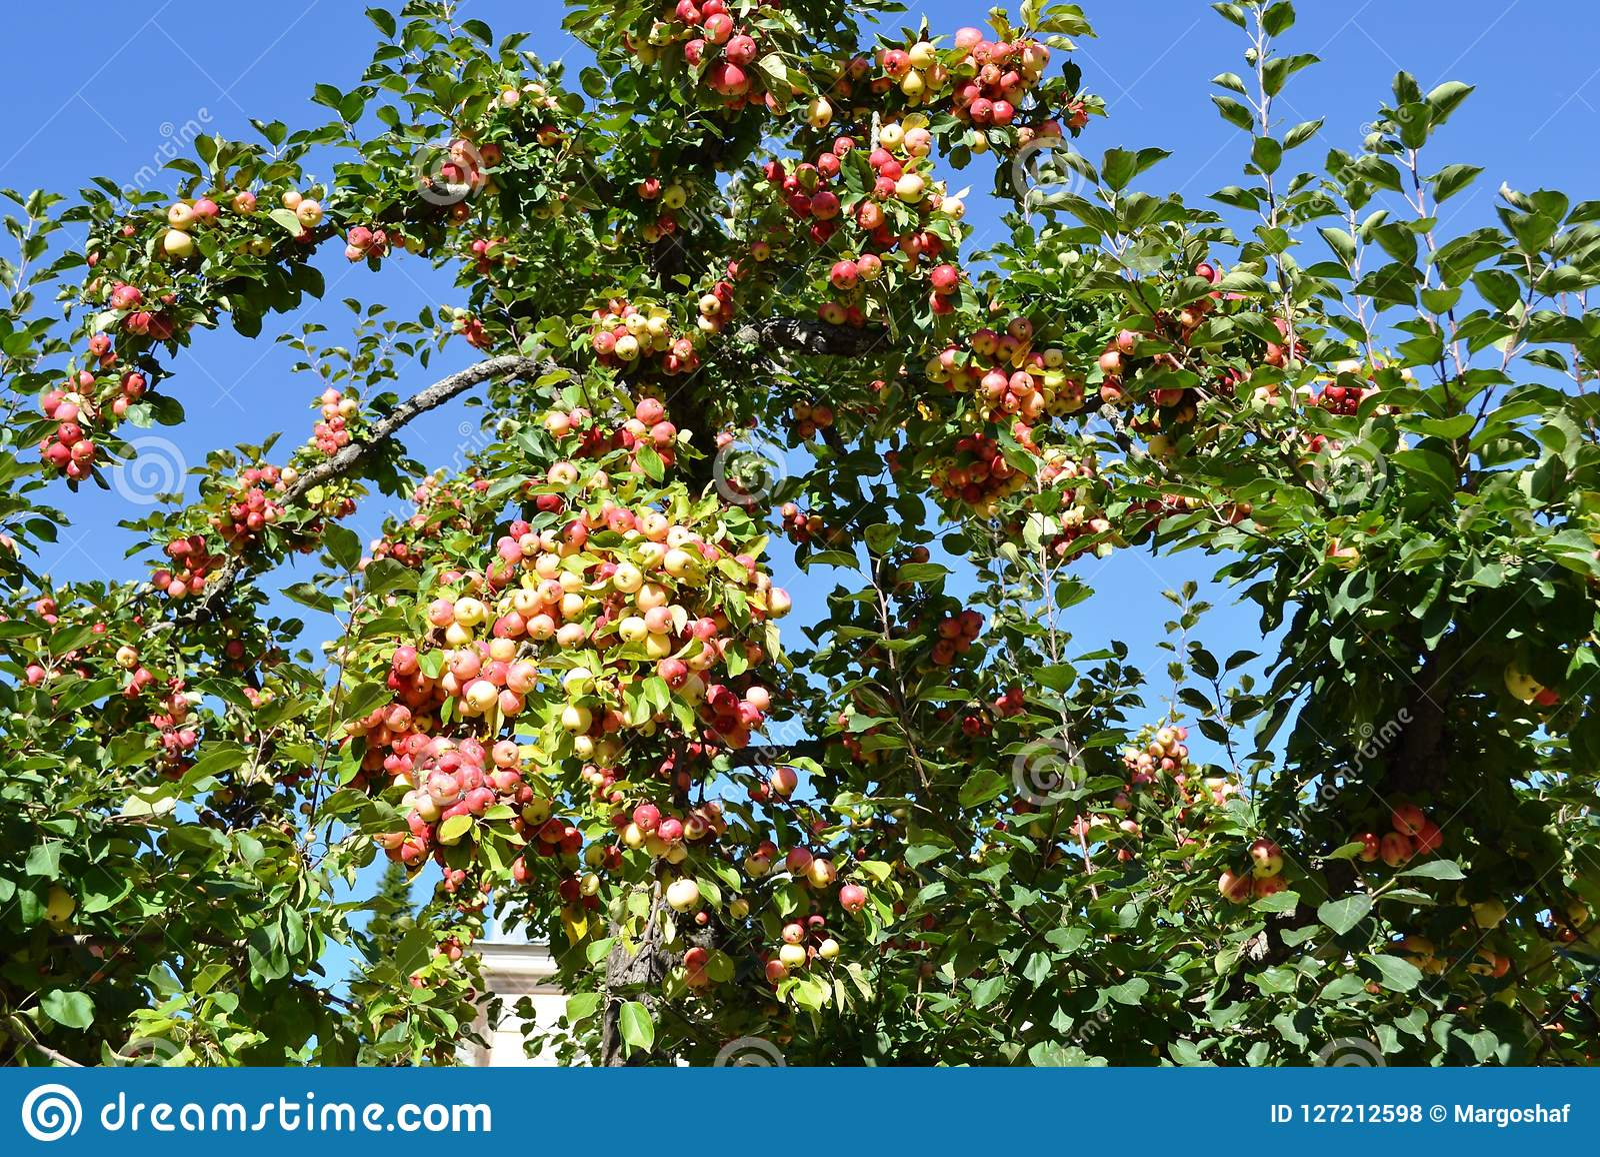 Red apples on apple tree branch, gardening, harvesting